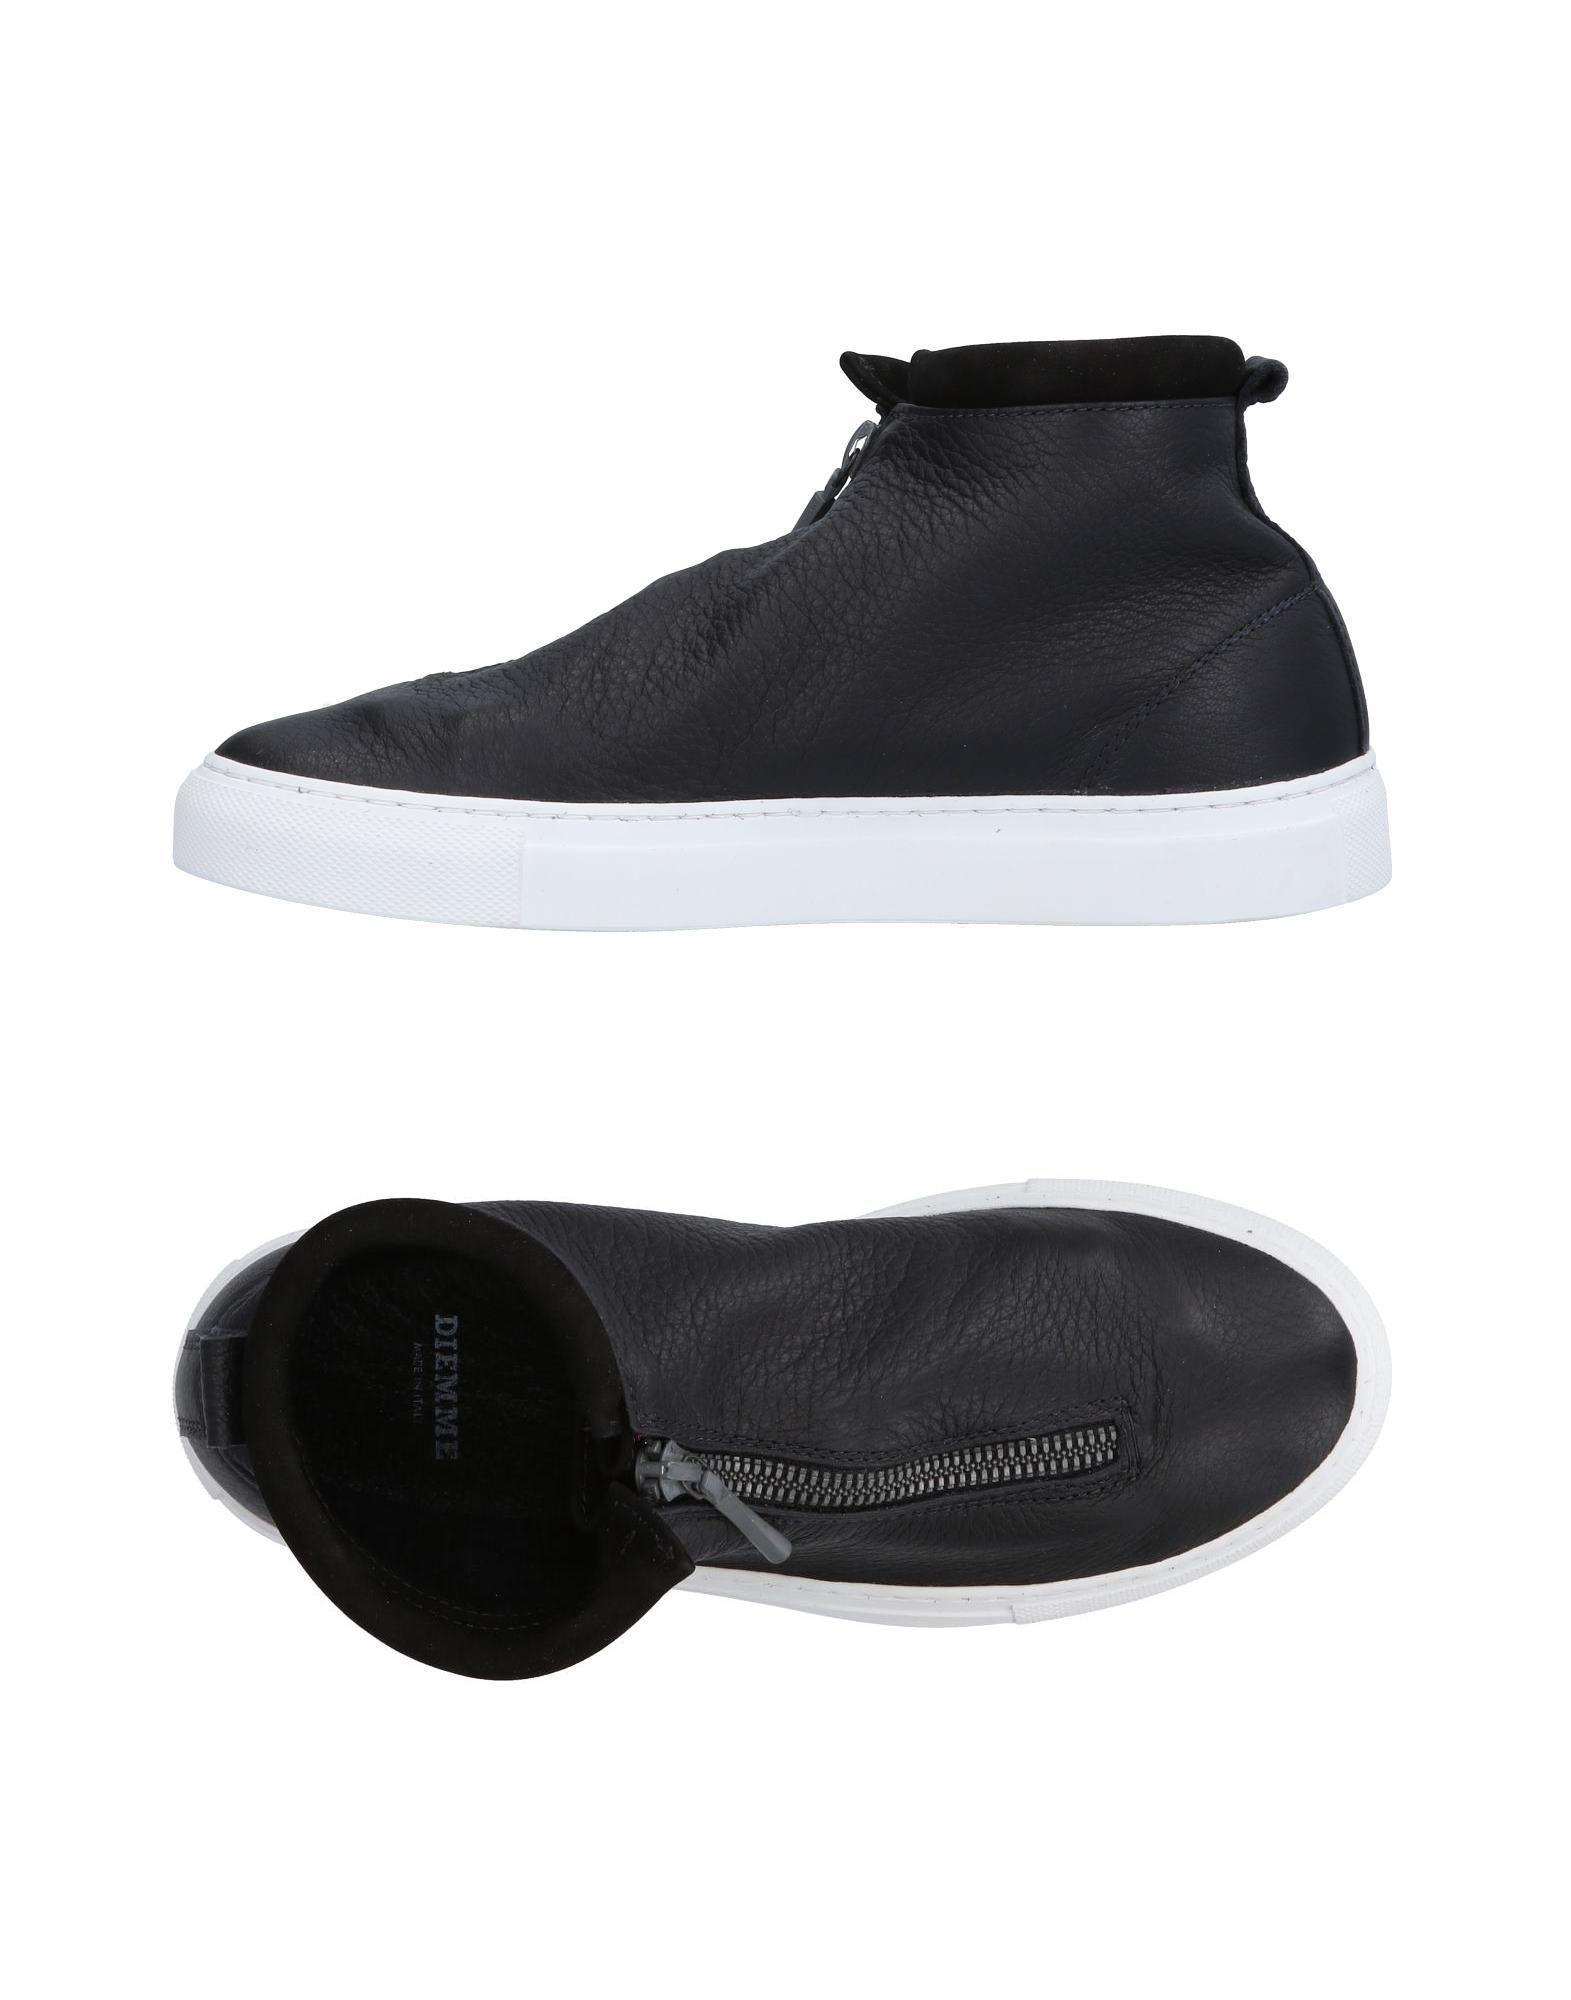 Moda 11498142CT Sneakers Diemme Donna - 11498142CT Moda a13735